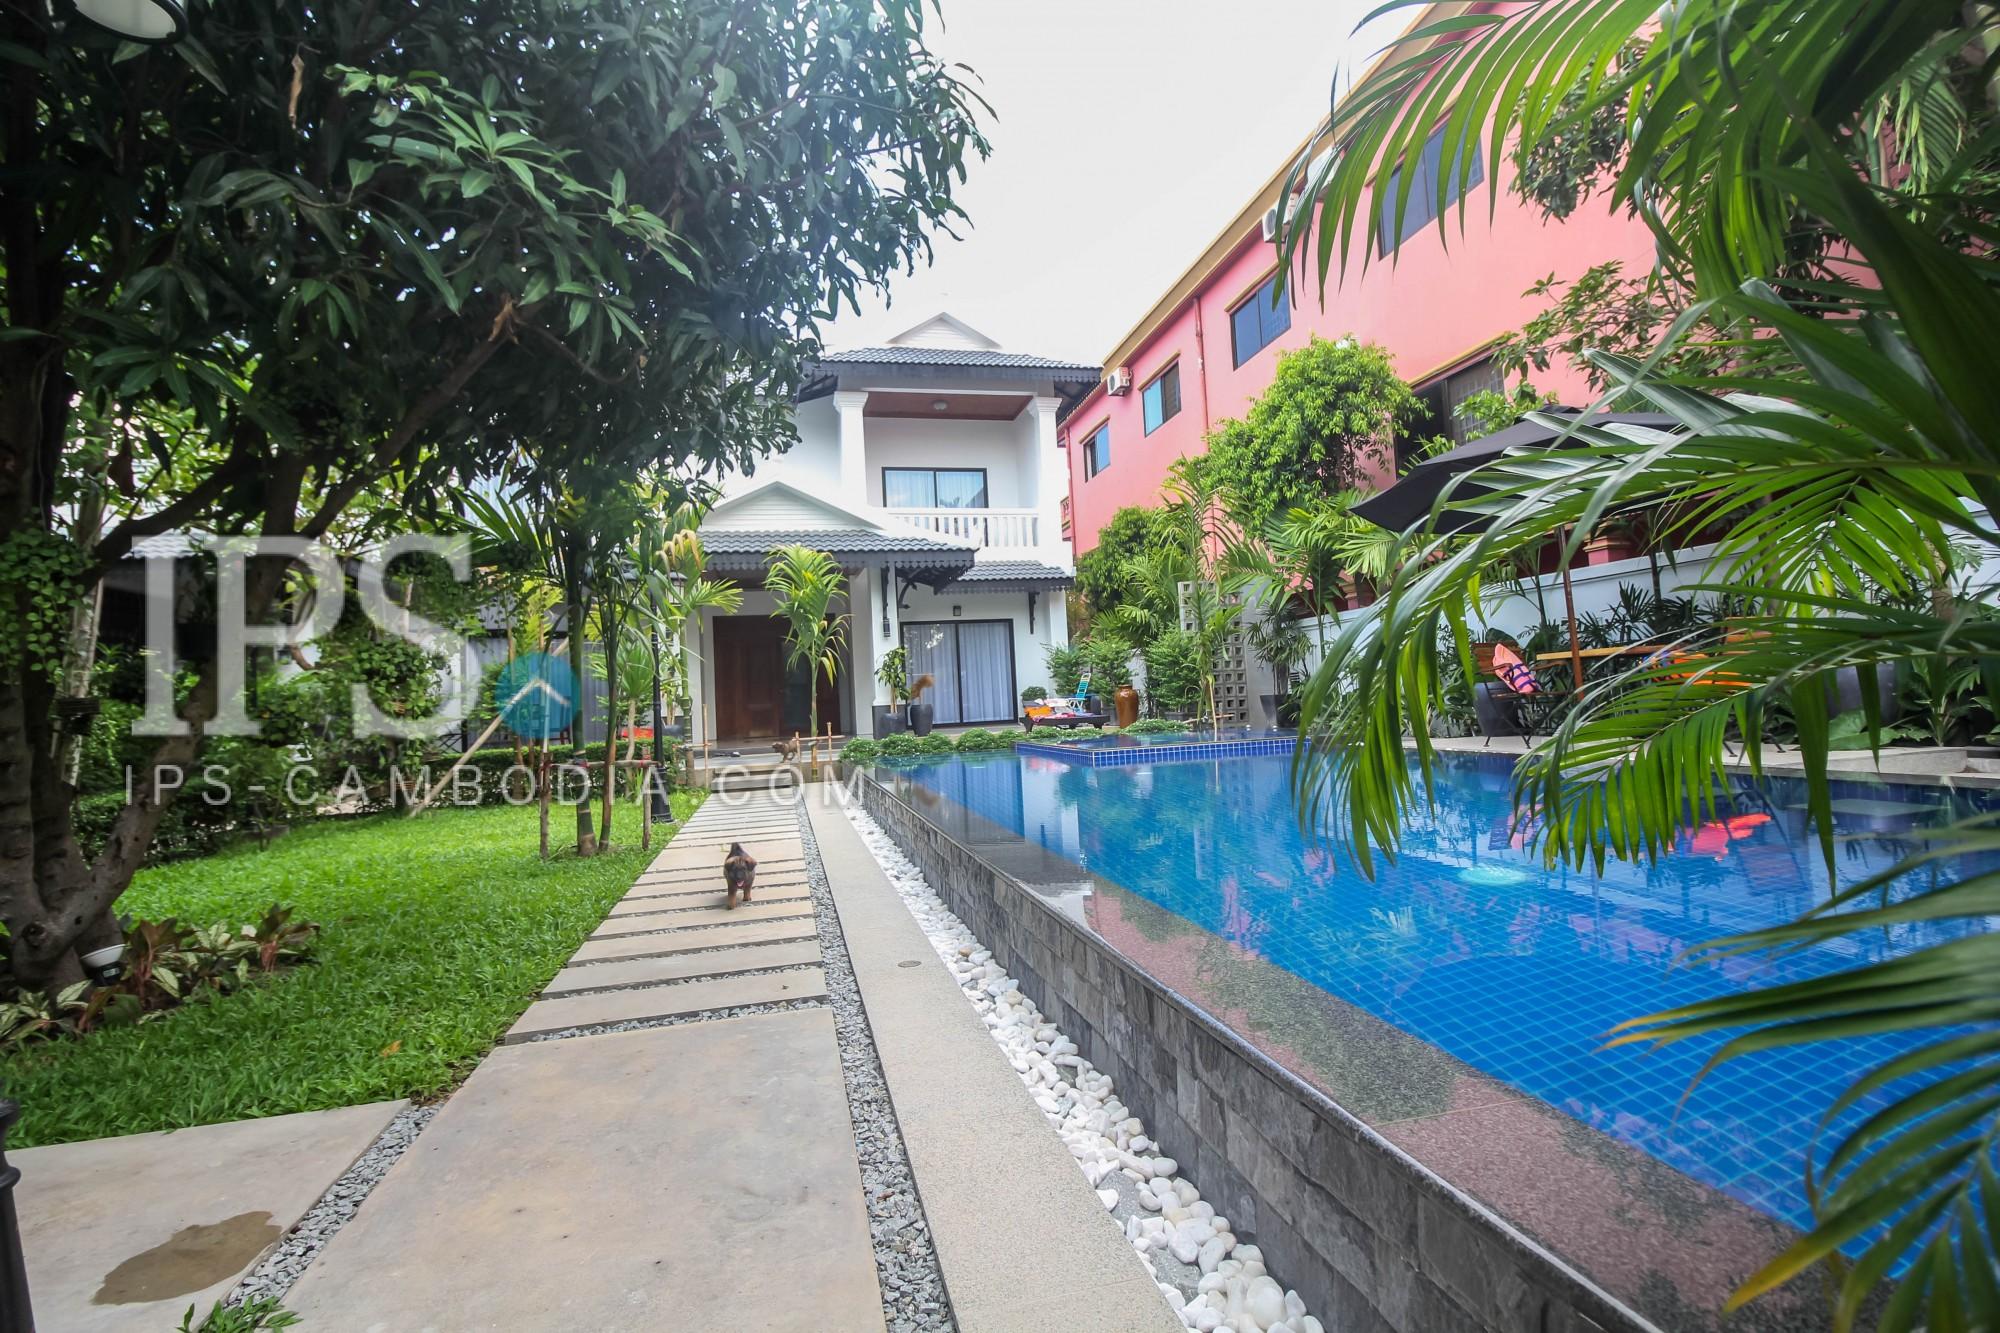 5 Bedroom Villa For Rent - Kouk Chak, Siem Reap